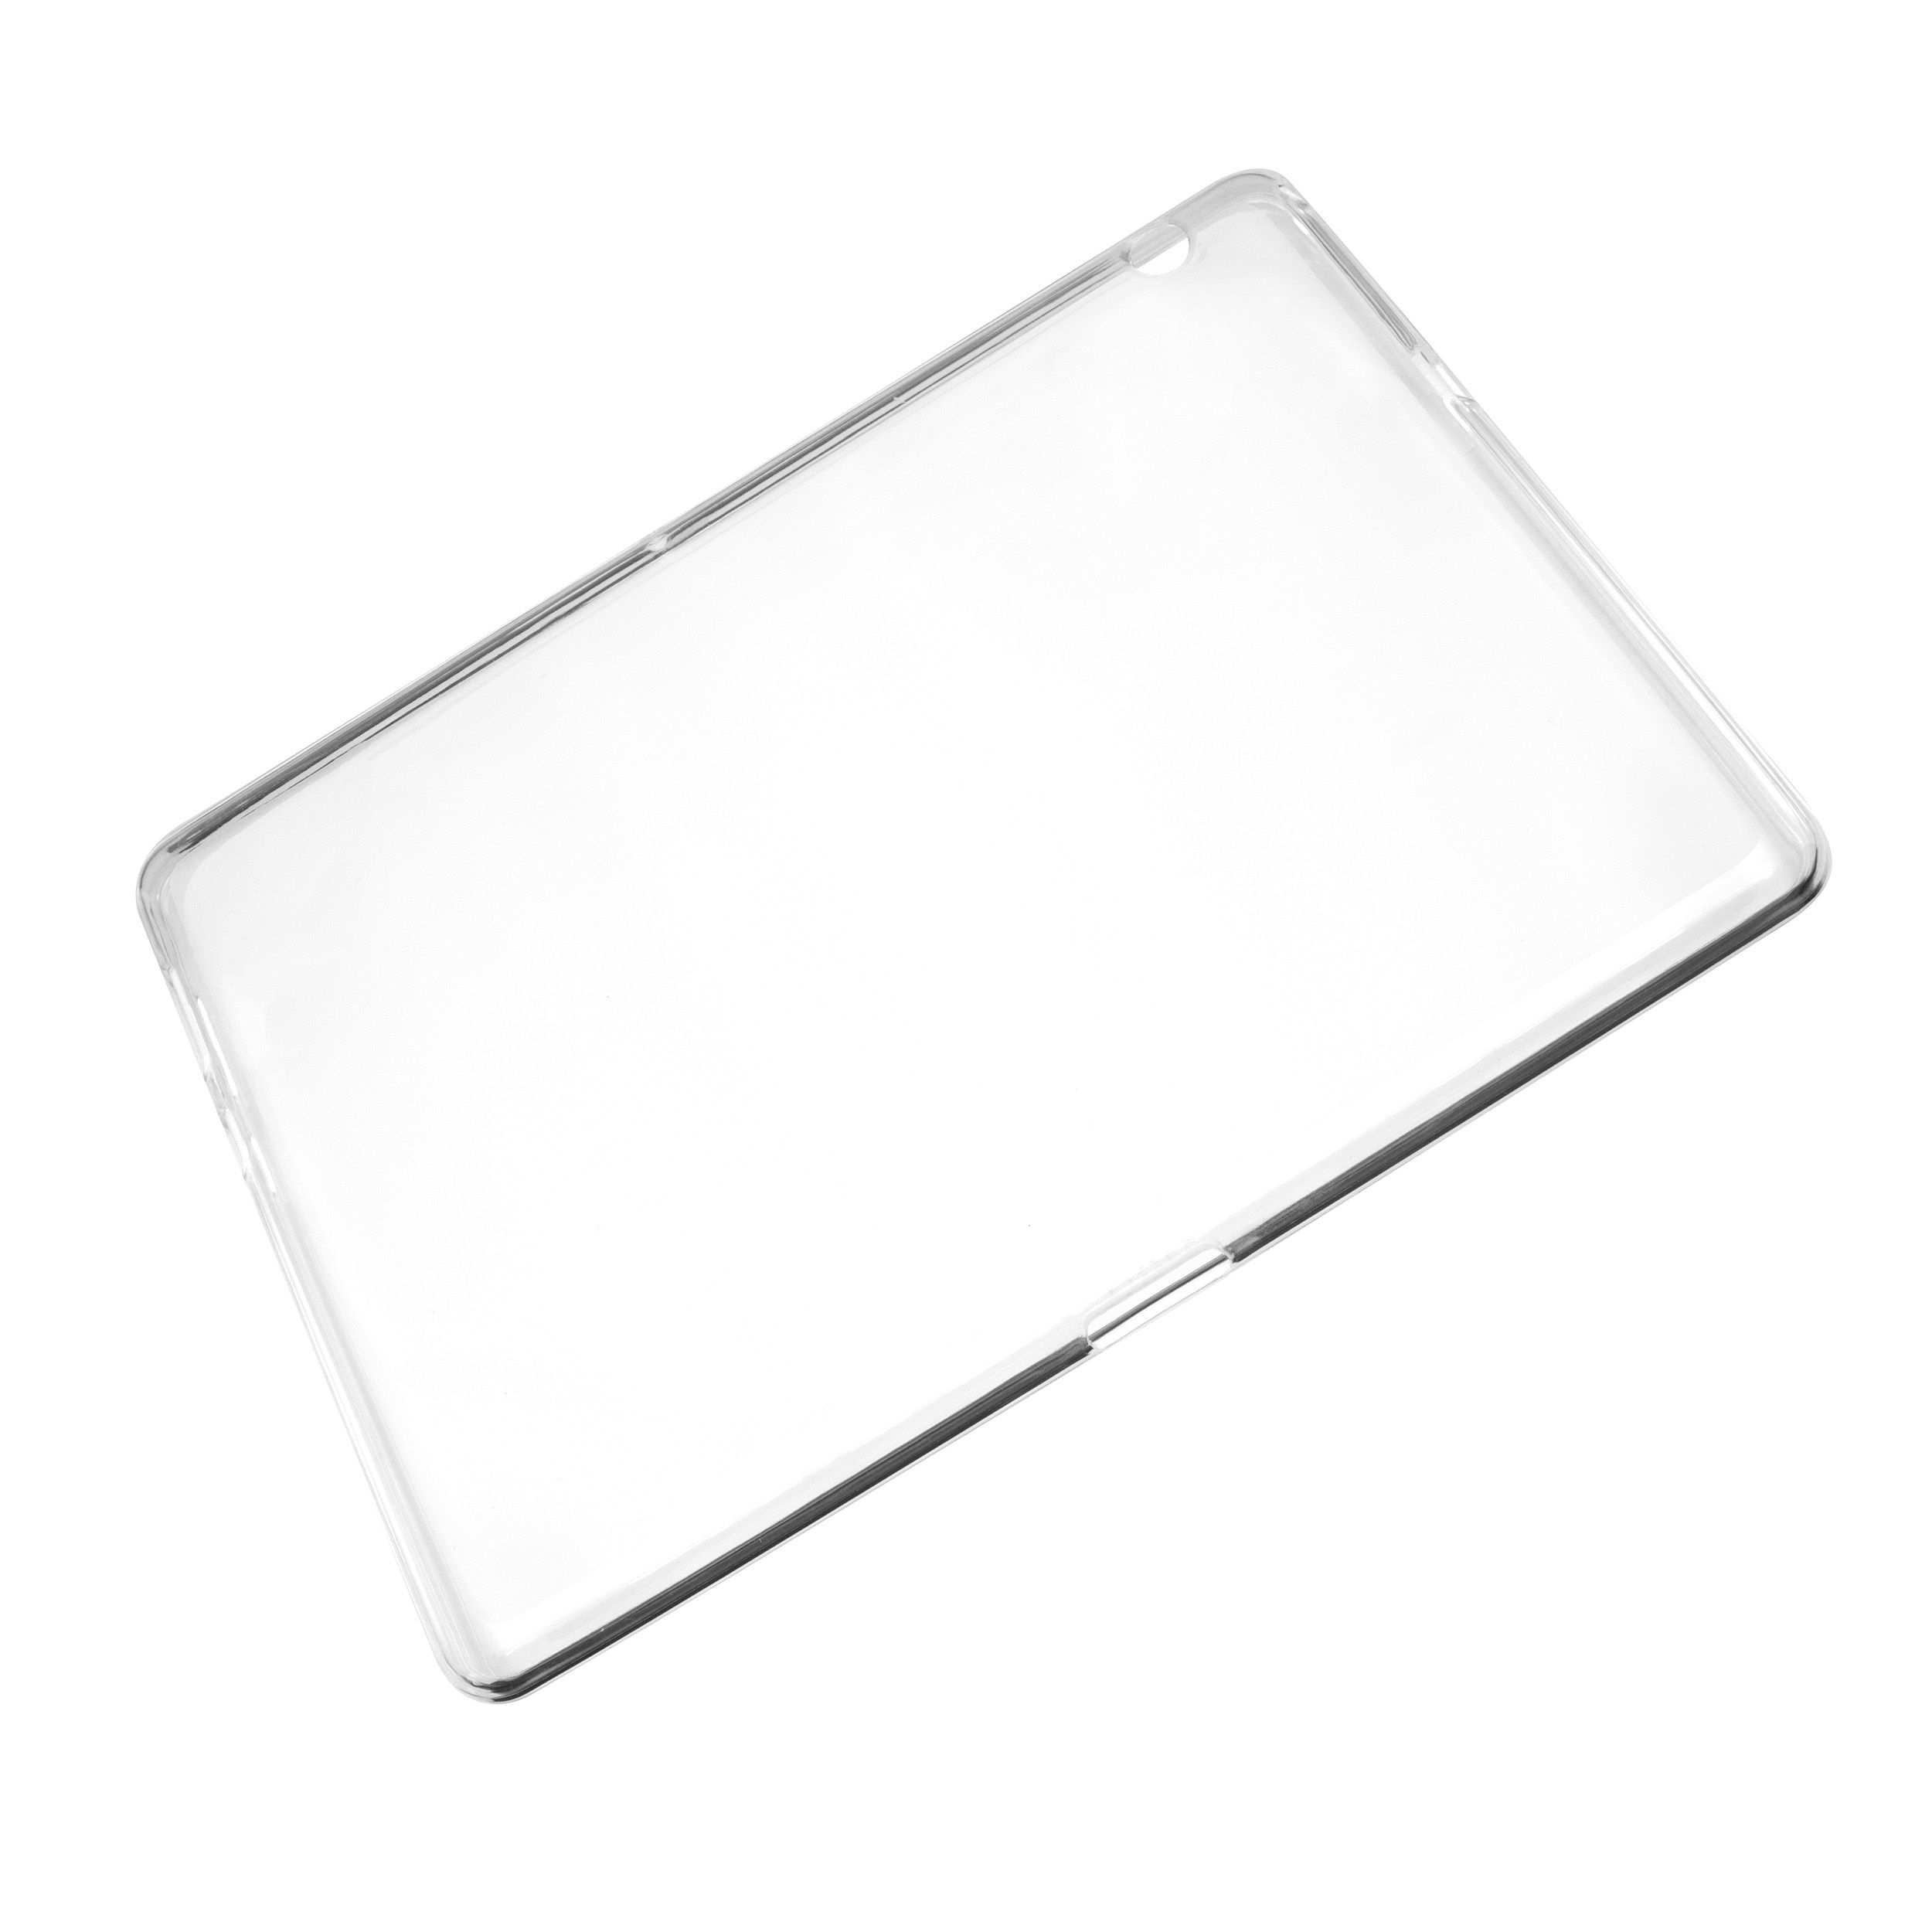 TPU gelové pouzdro FIXED pro Huawei MediaPad T3 10, čiré